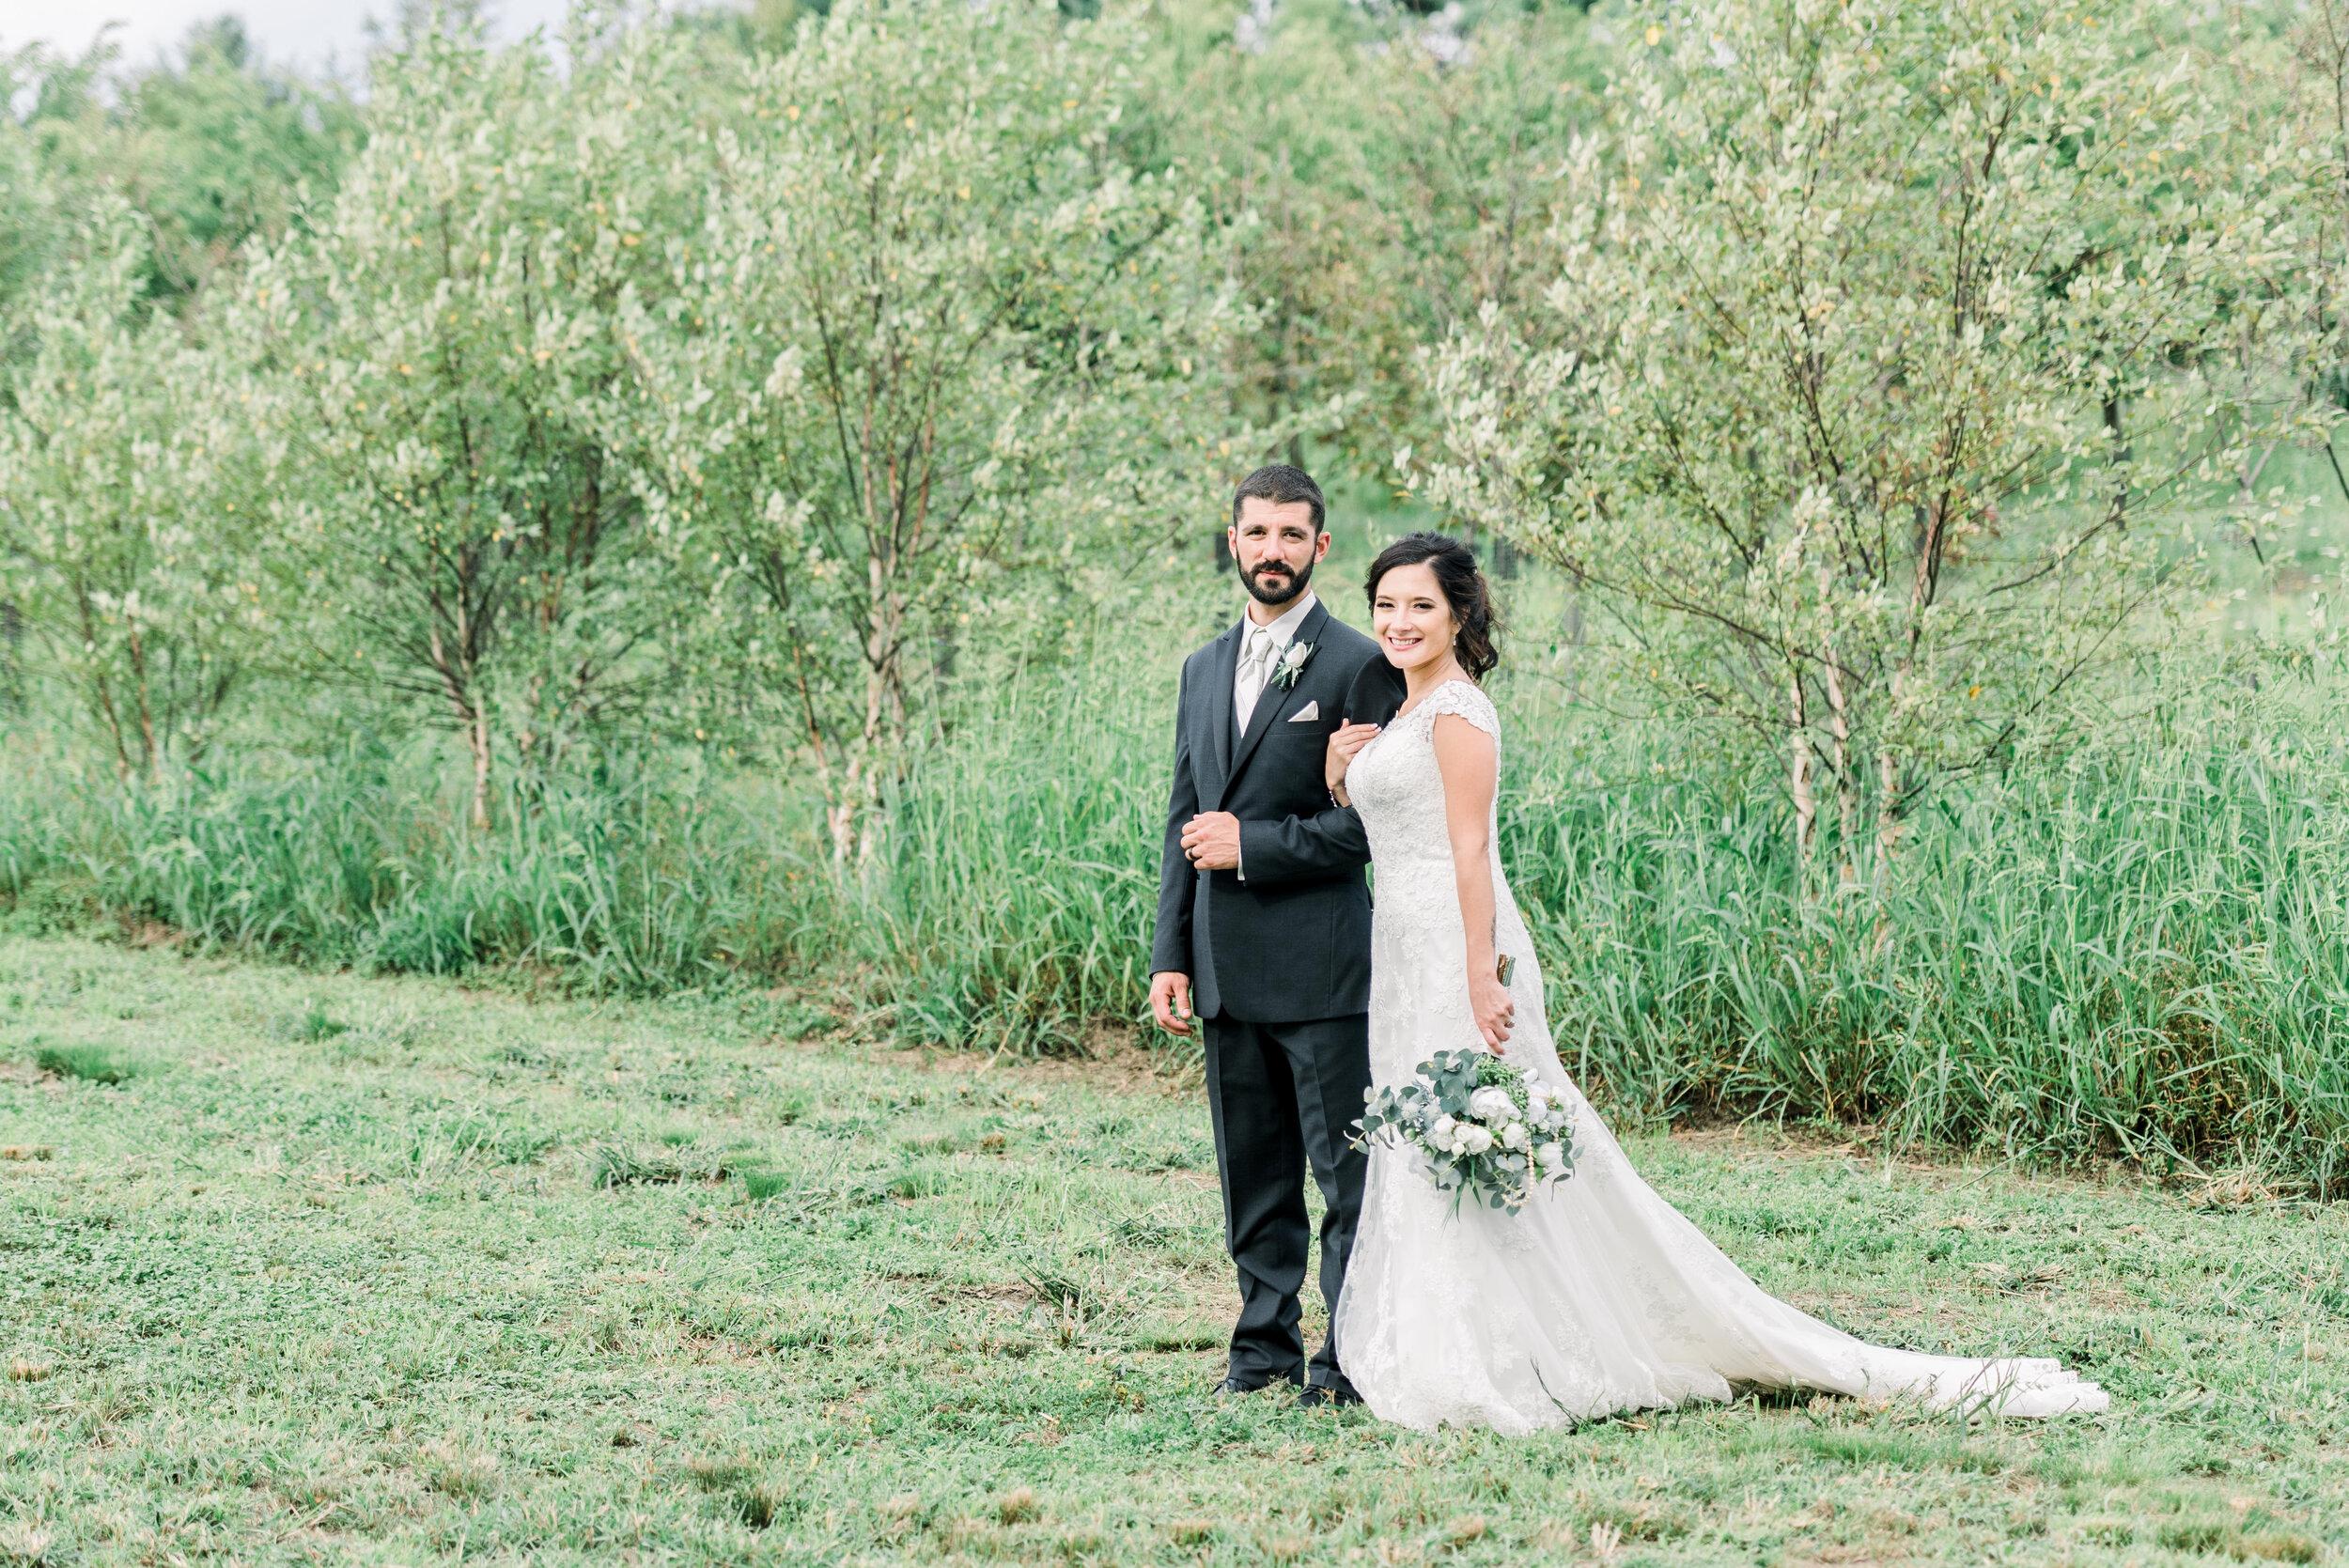 Pinehall-At-Eisler-Farms-Wedding-Ashley-Reed-Photography-33.jpg